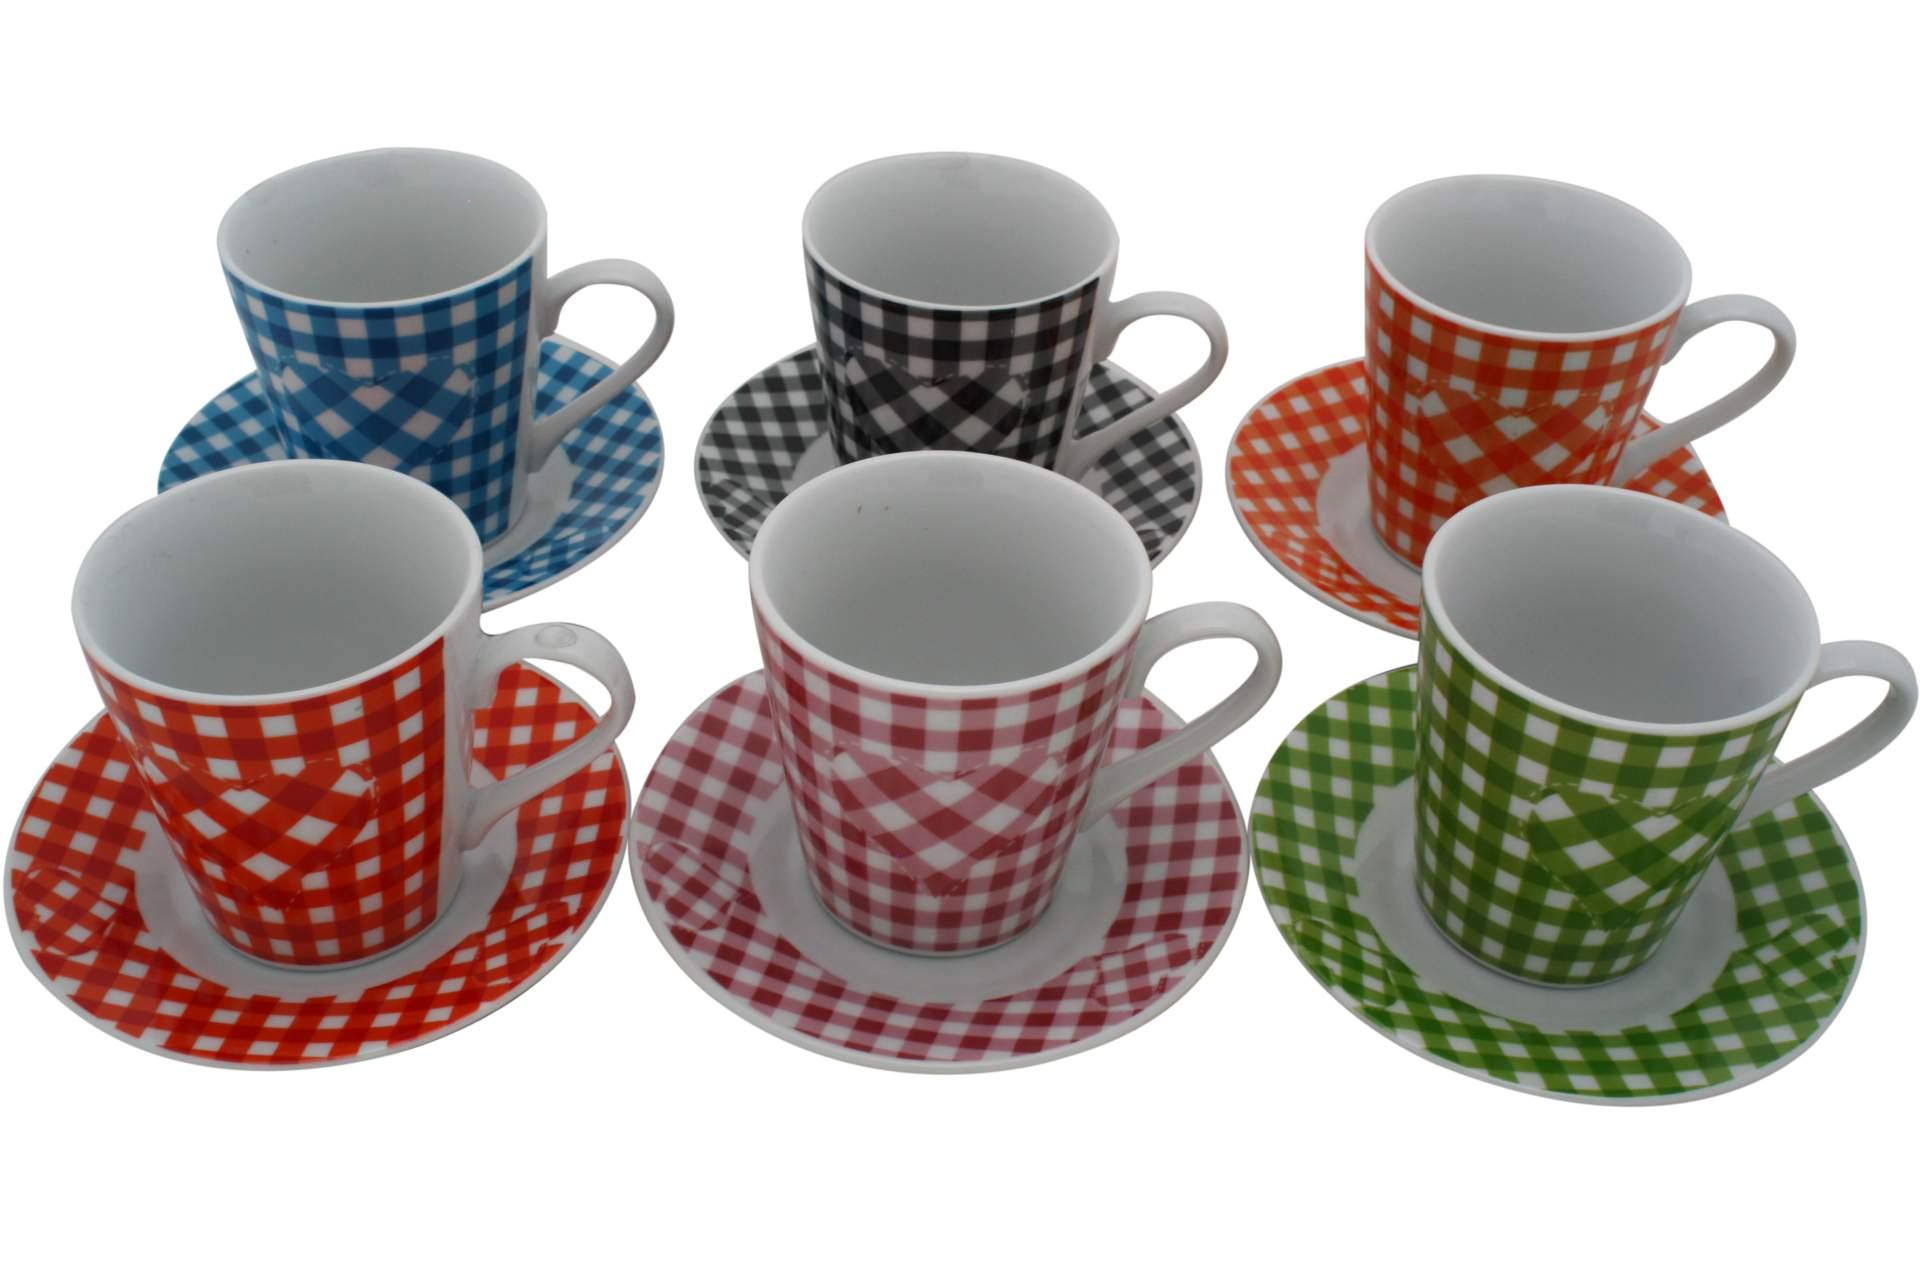 6 er cappuccino tassen set karomotiv tasse mit untertasse cappuccinotasse 12 tlg ebay. Black Bedroom Furniture Sets. Home Design Ideas